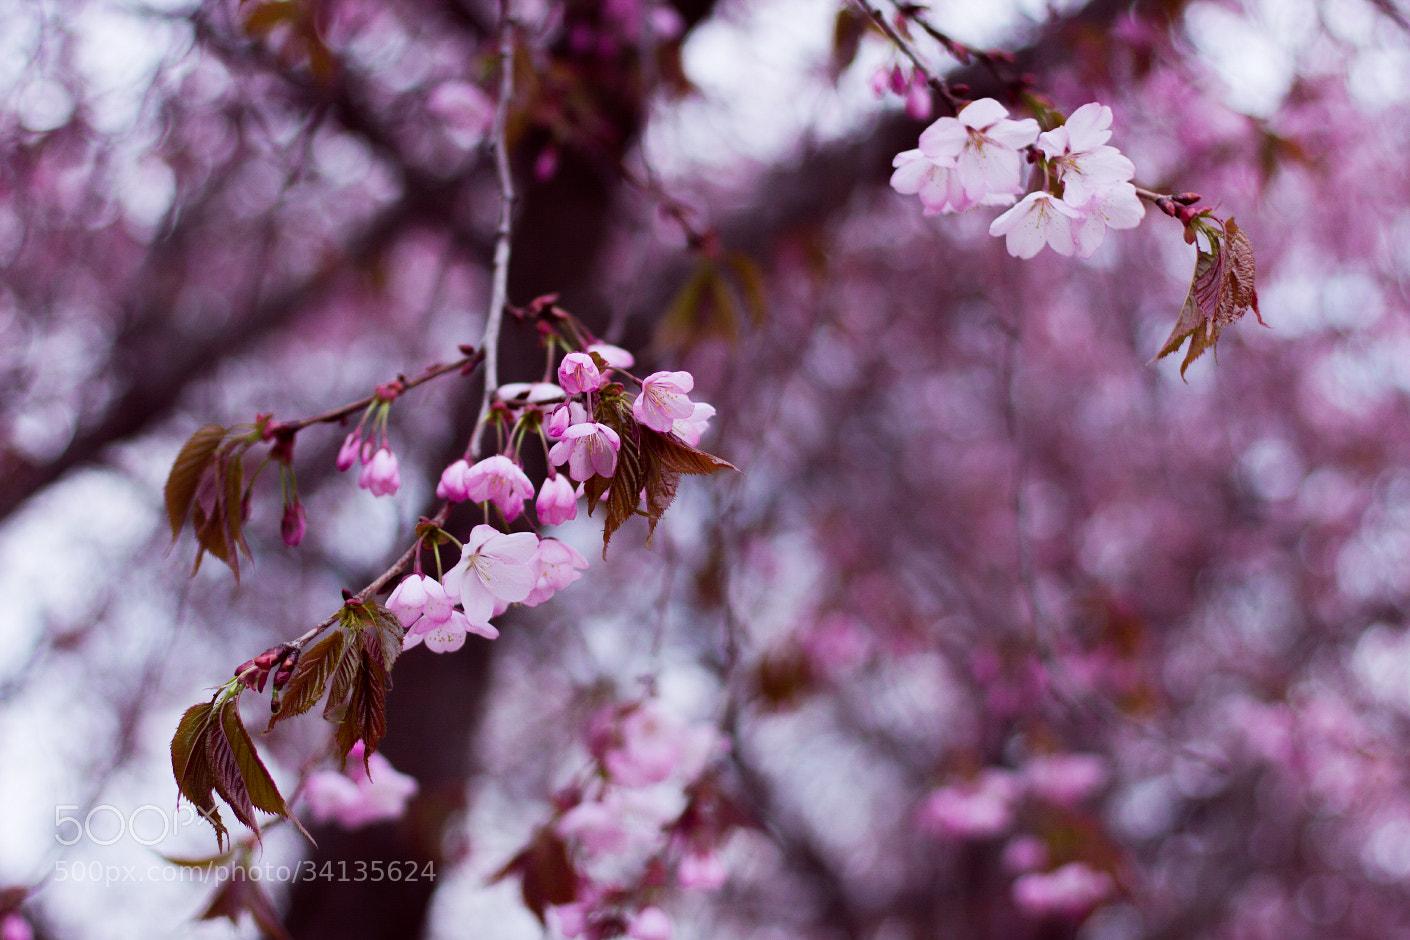 Photograph bloom by Kauri Uusimies on 500px